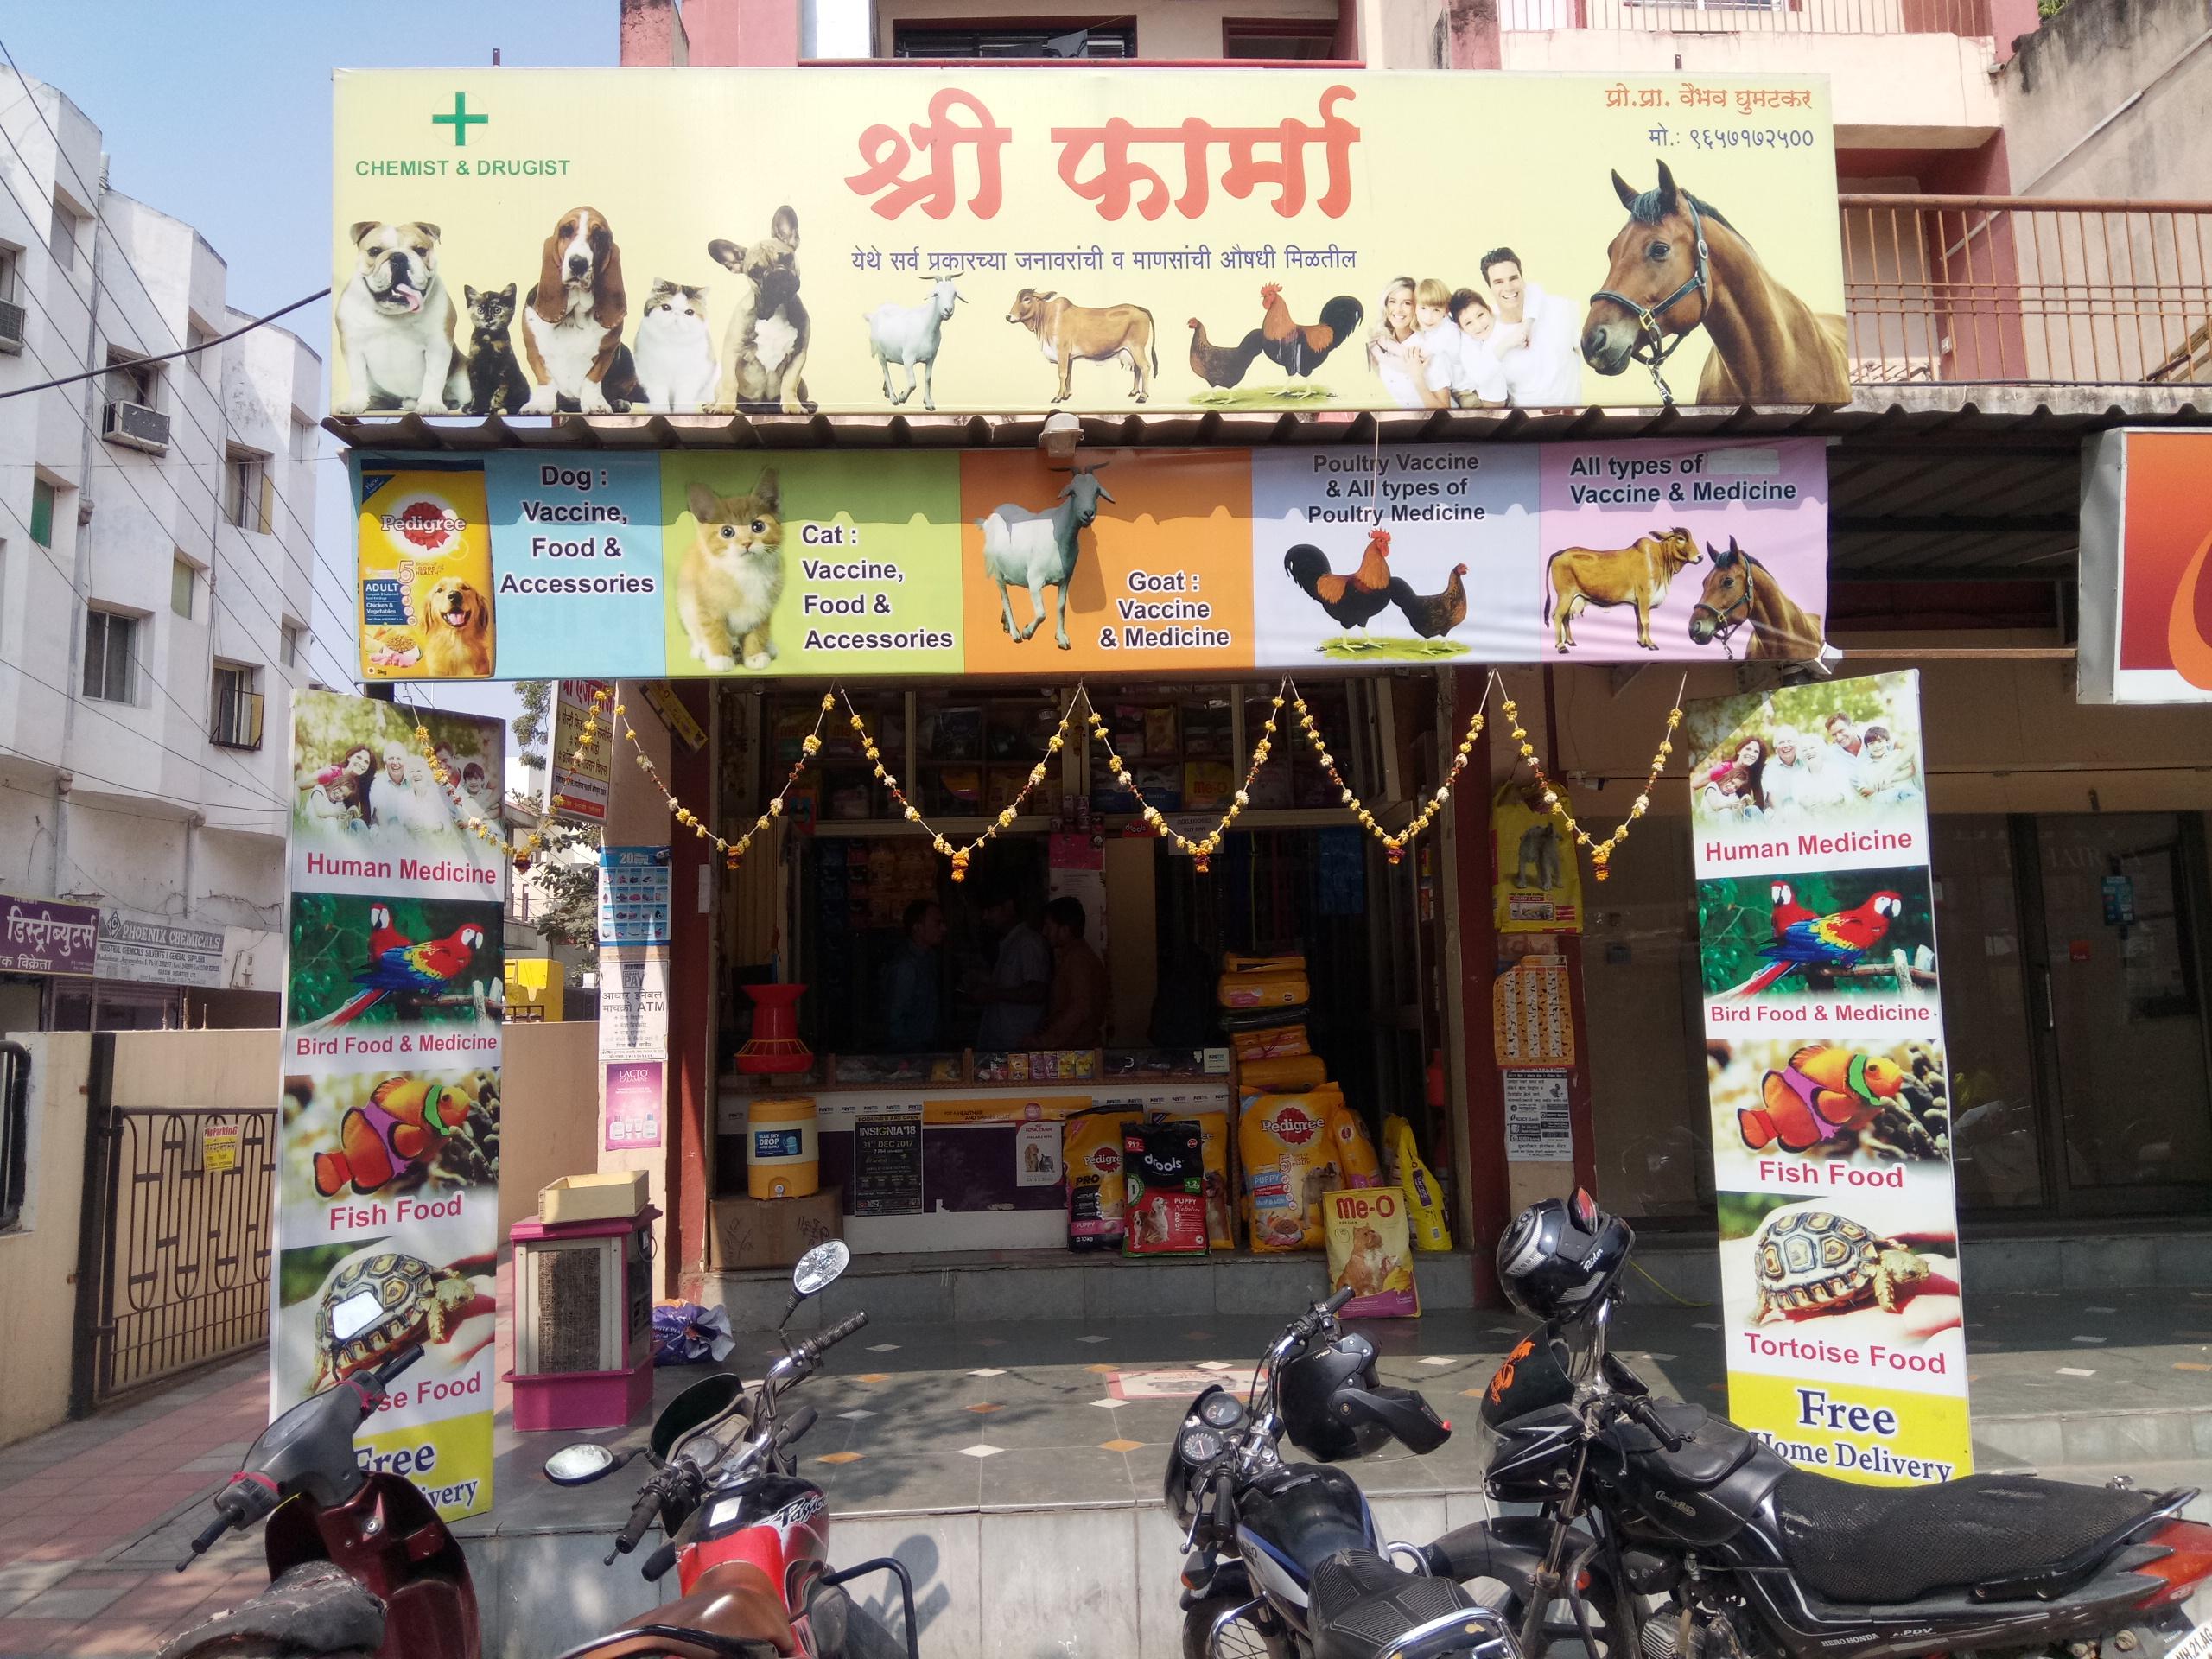 Shri Pharma & Shri Agency_image0